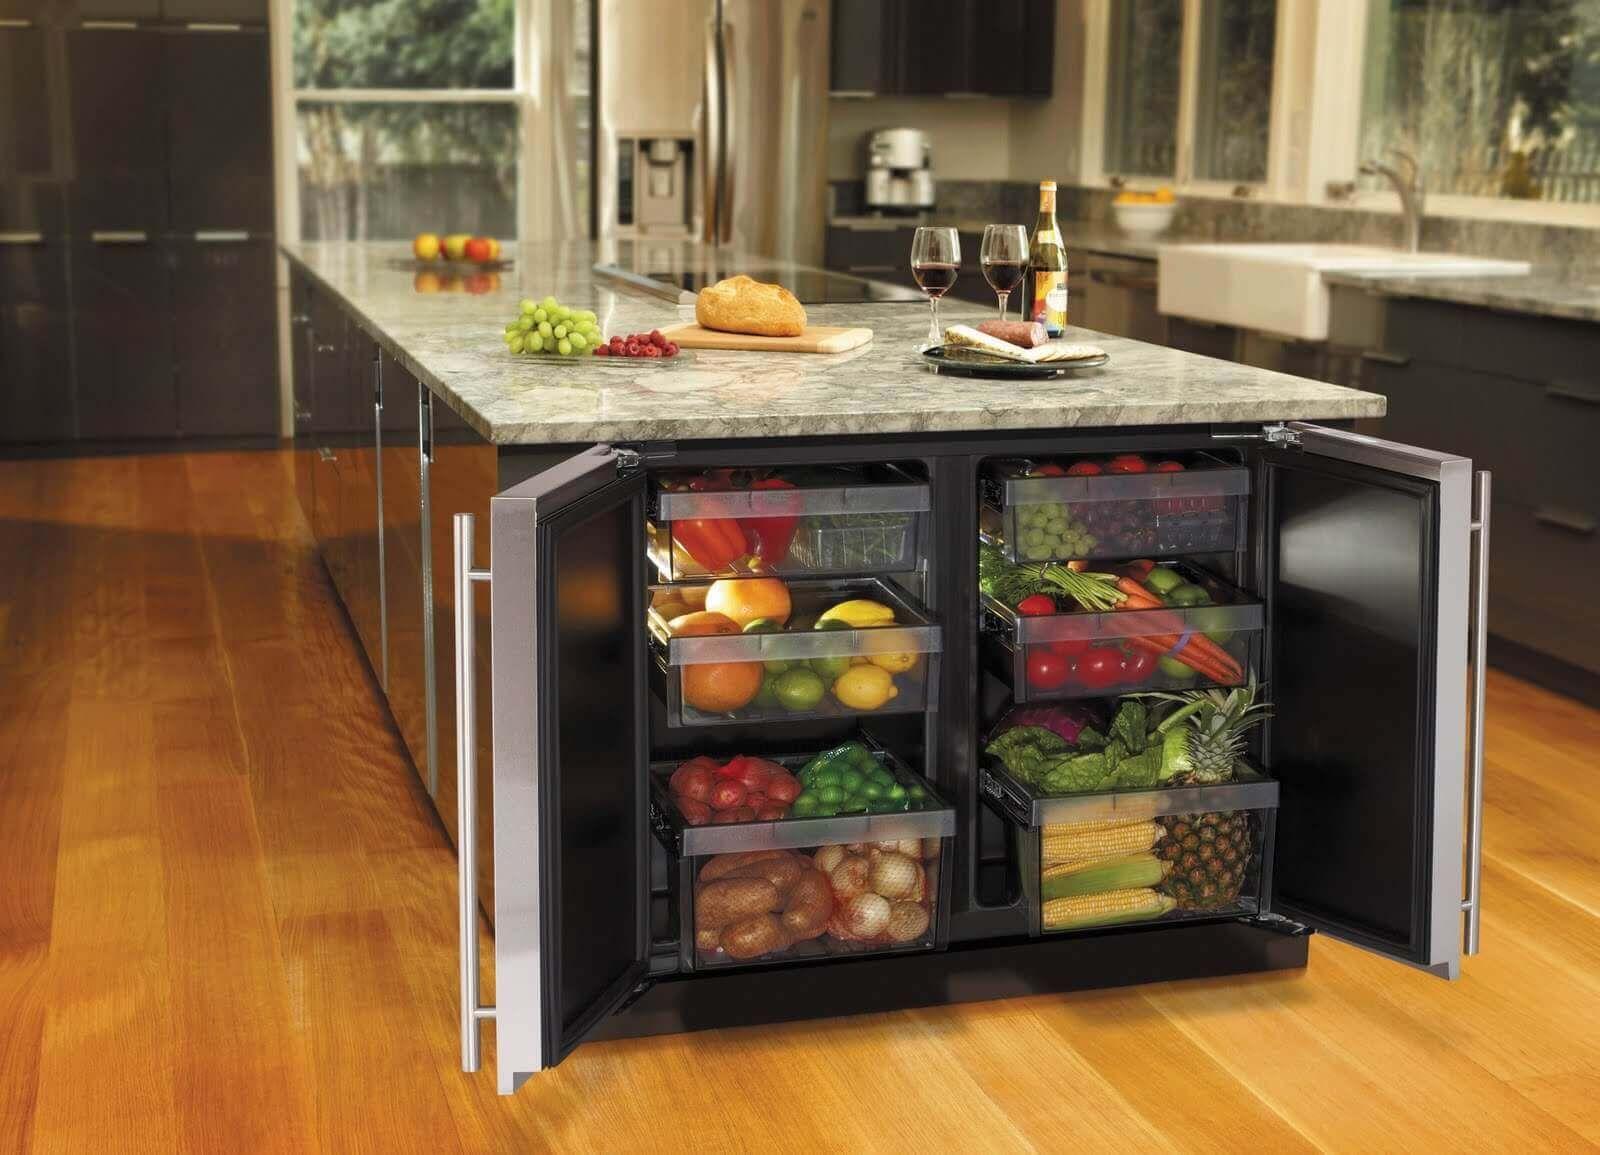 68 Deluxe Custom Kitchen Island Ideas Jaw Dropping Designs Interior Design Kitchen Kitchen Design Home Decor Kitchen Kitchen island base ideas